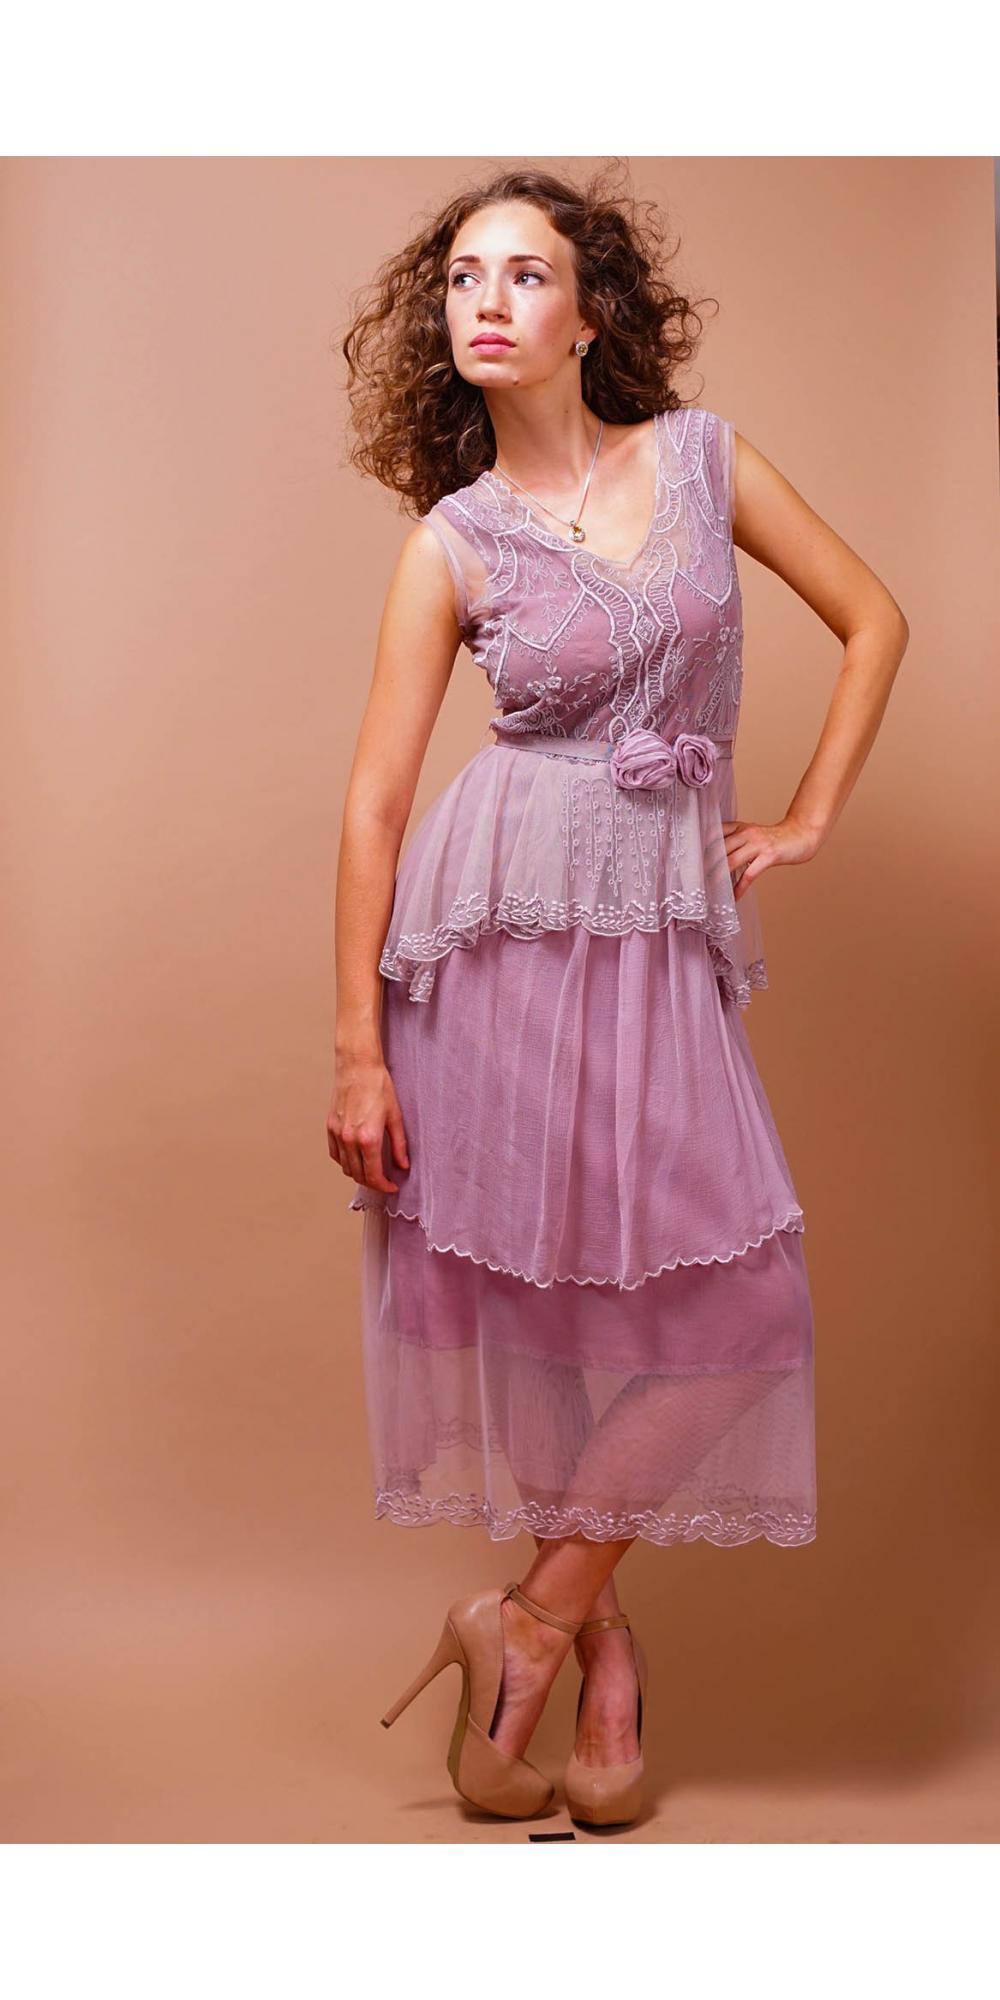 Vintage Look Party Dresses